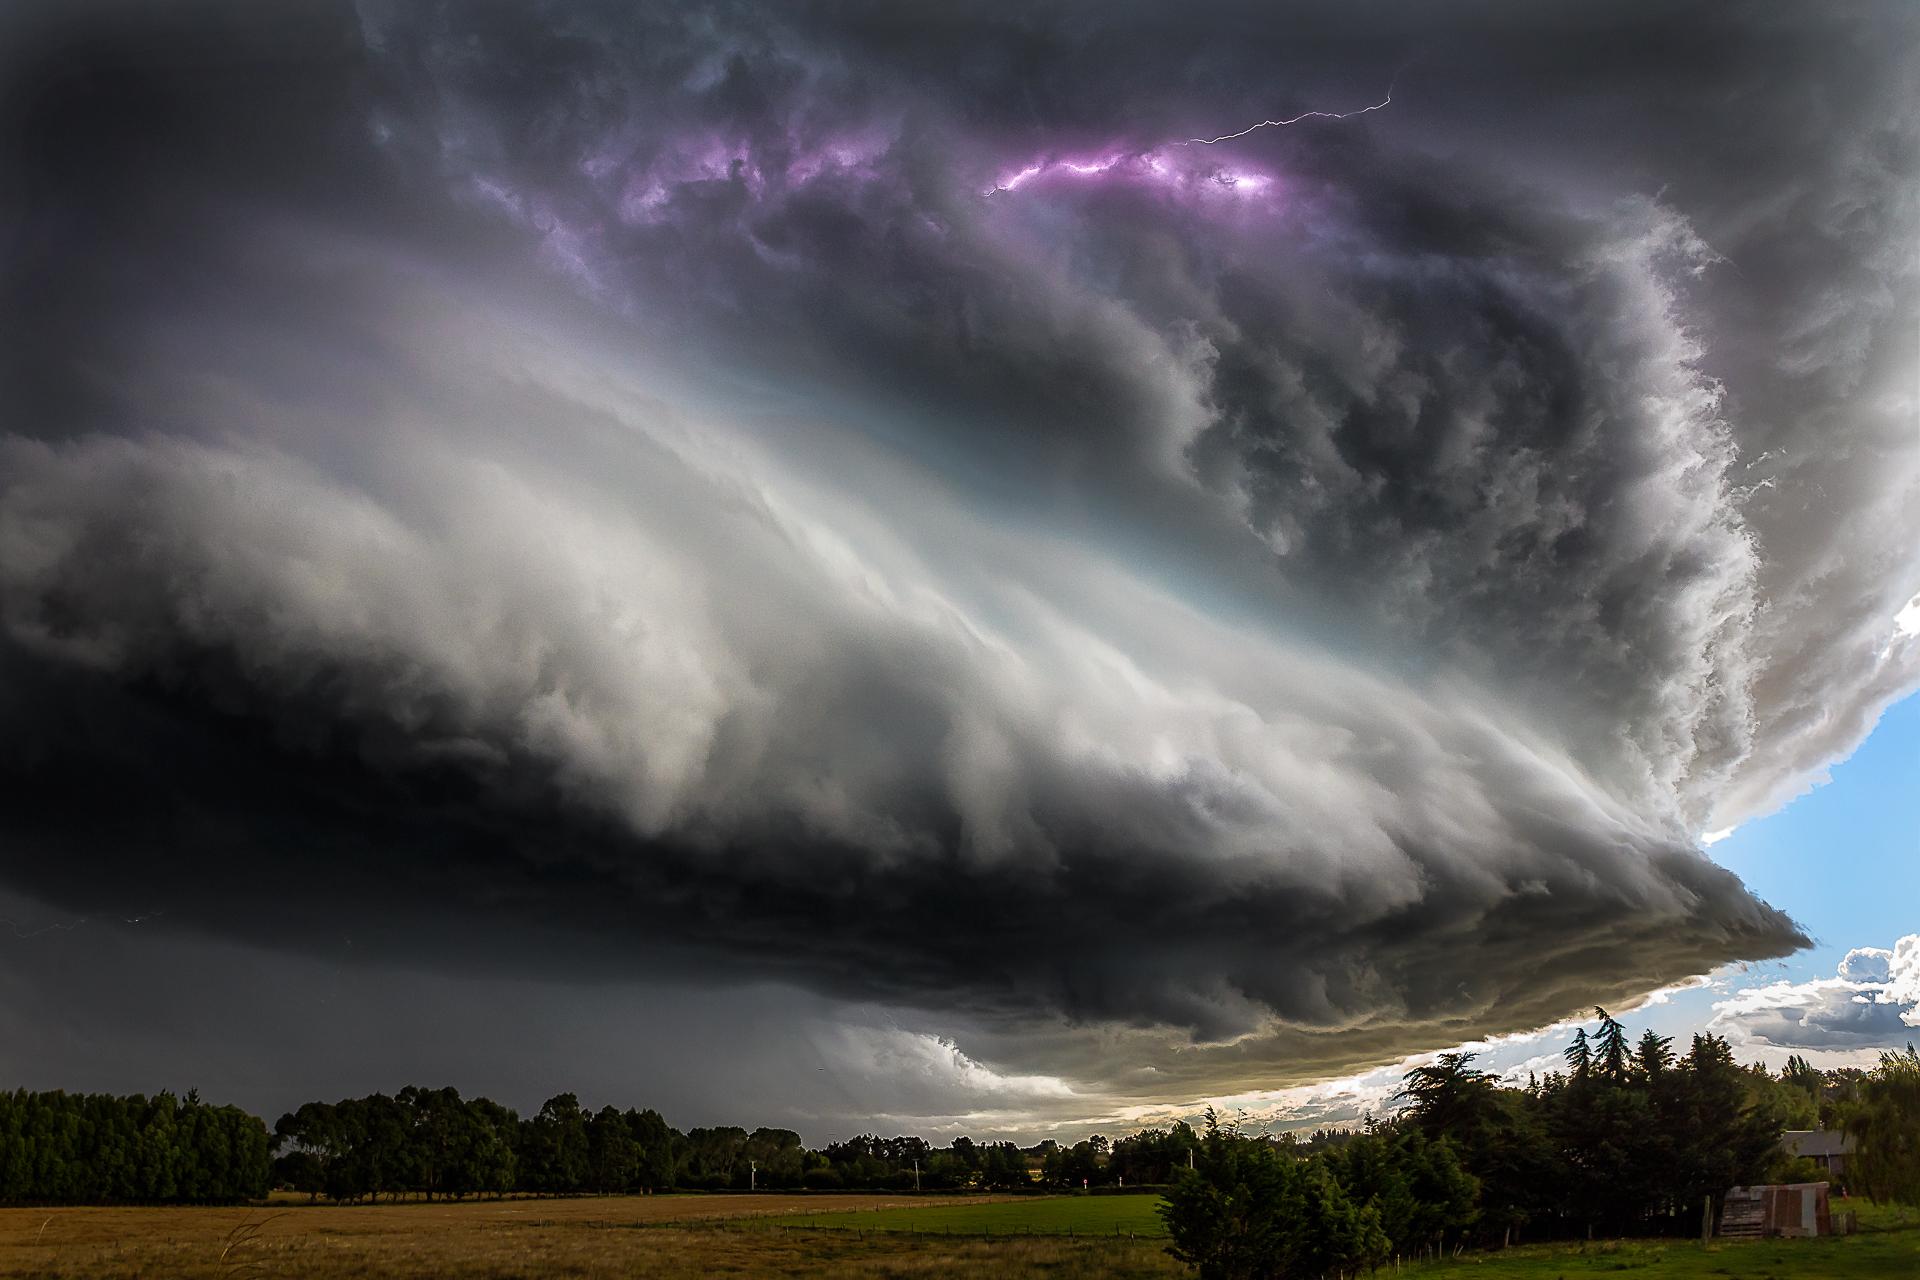 Go Back Images For Supercell Thunderstorm Wallpaper 1920x1280